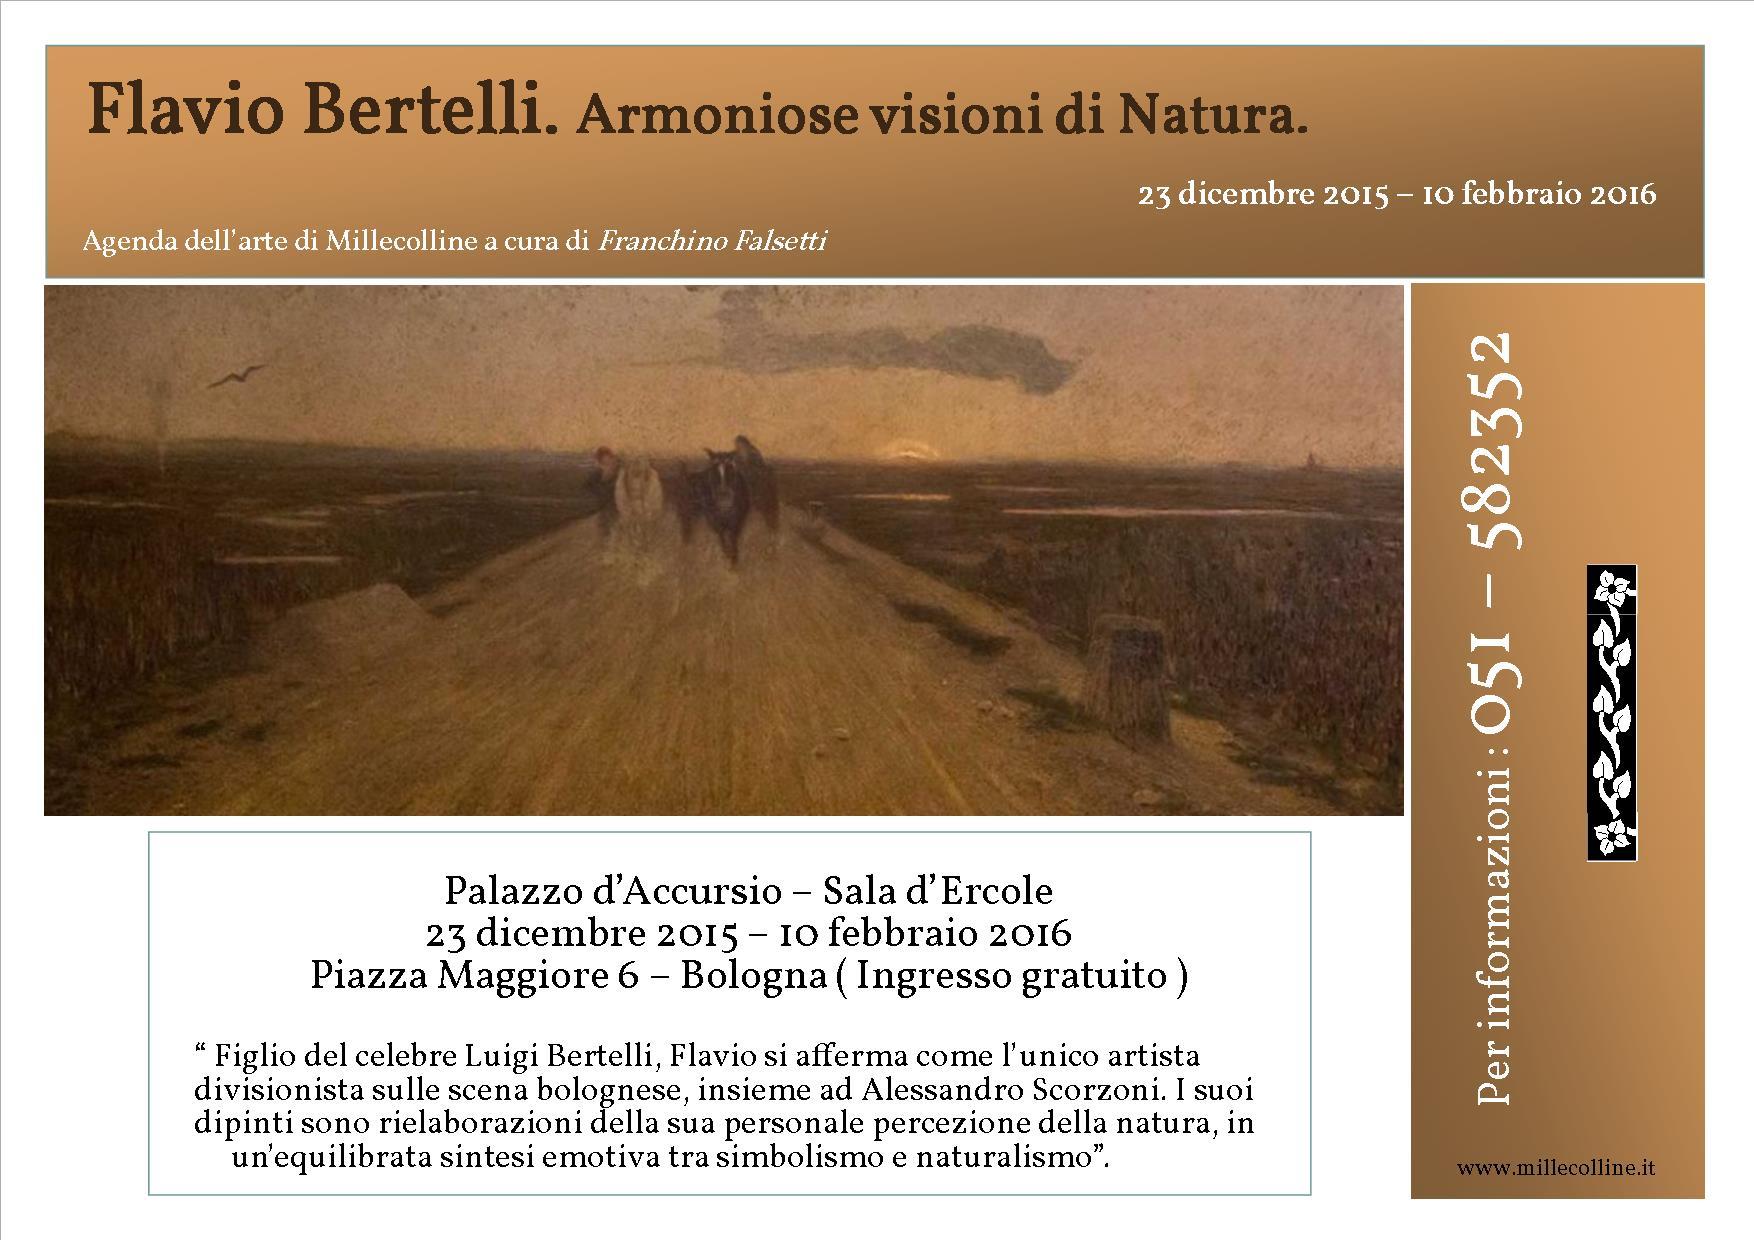 Agenda - Bertelli